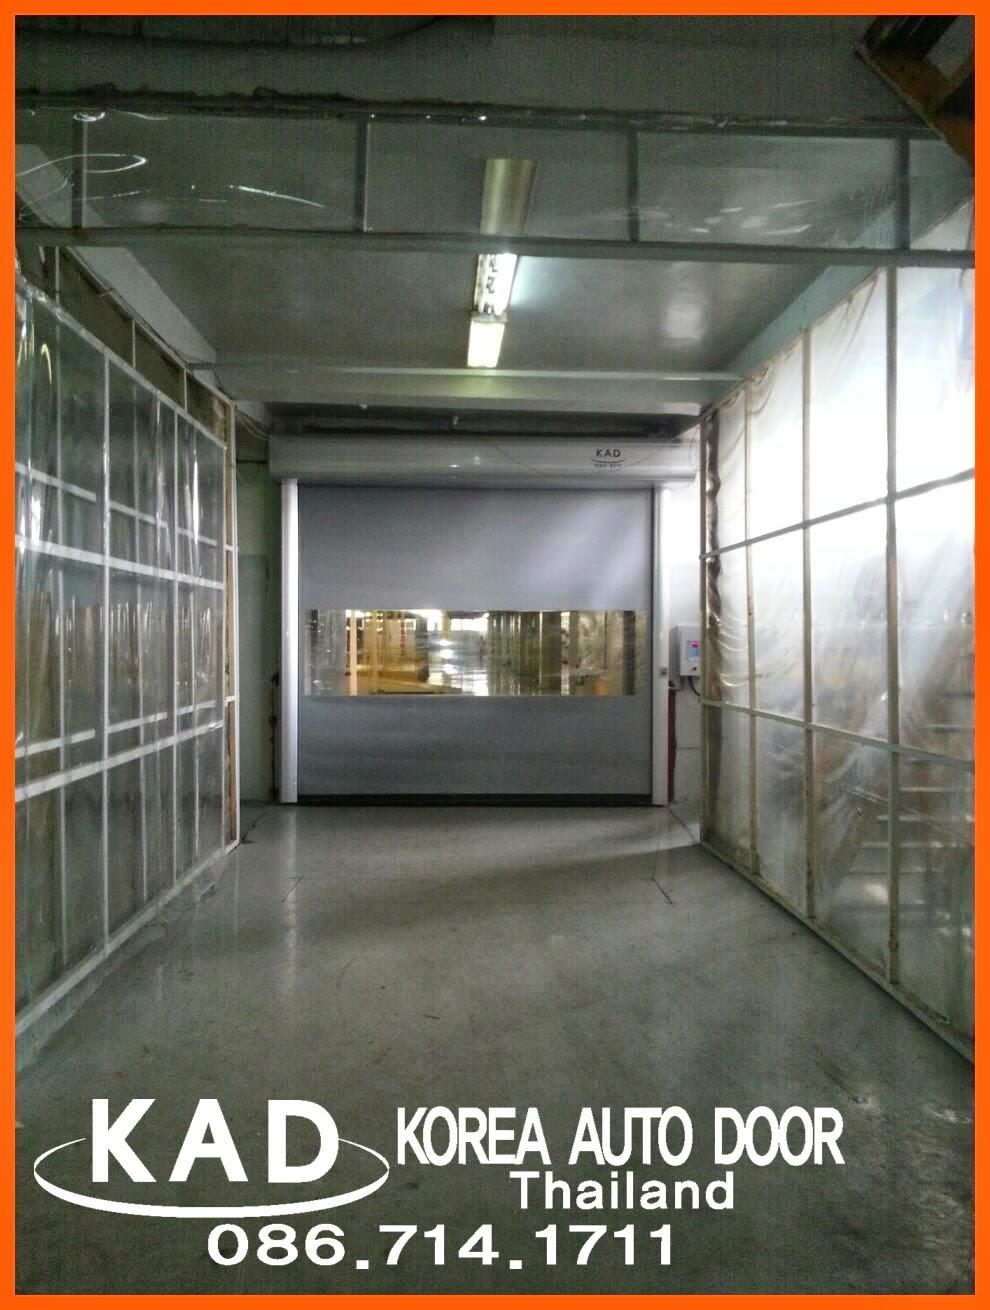 This is a high speed door(ประตูอุตสาหกรรม)